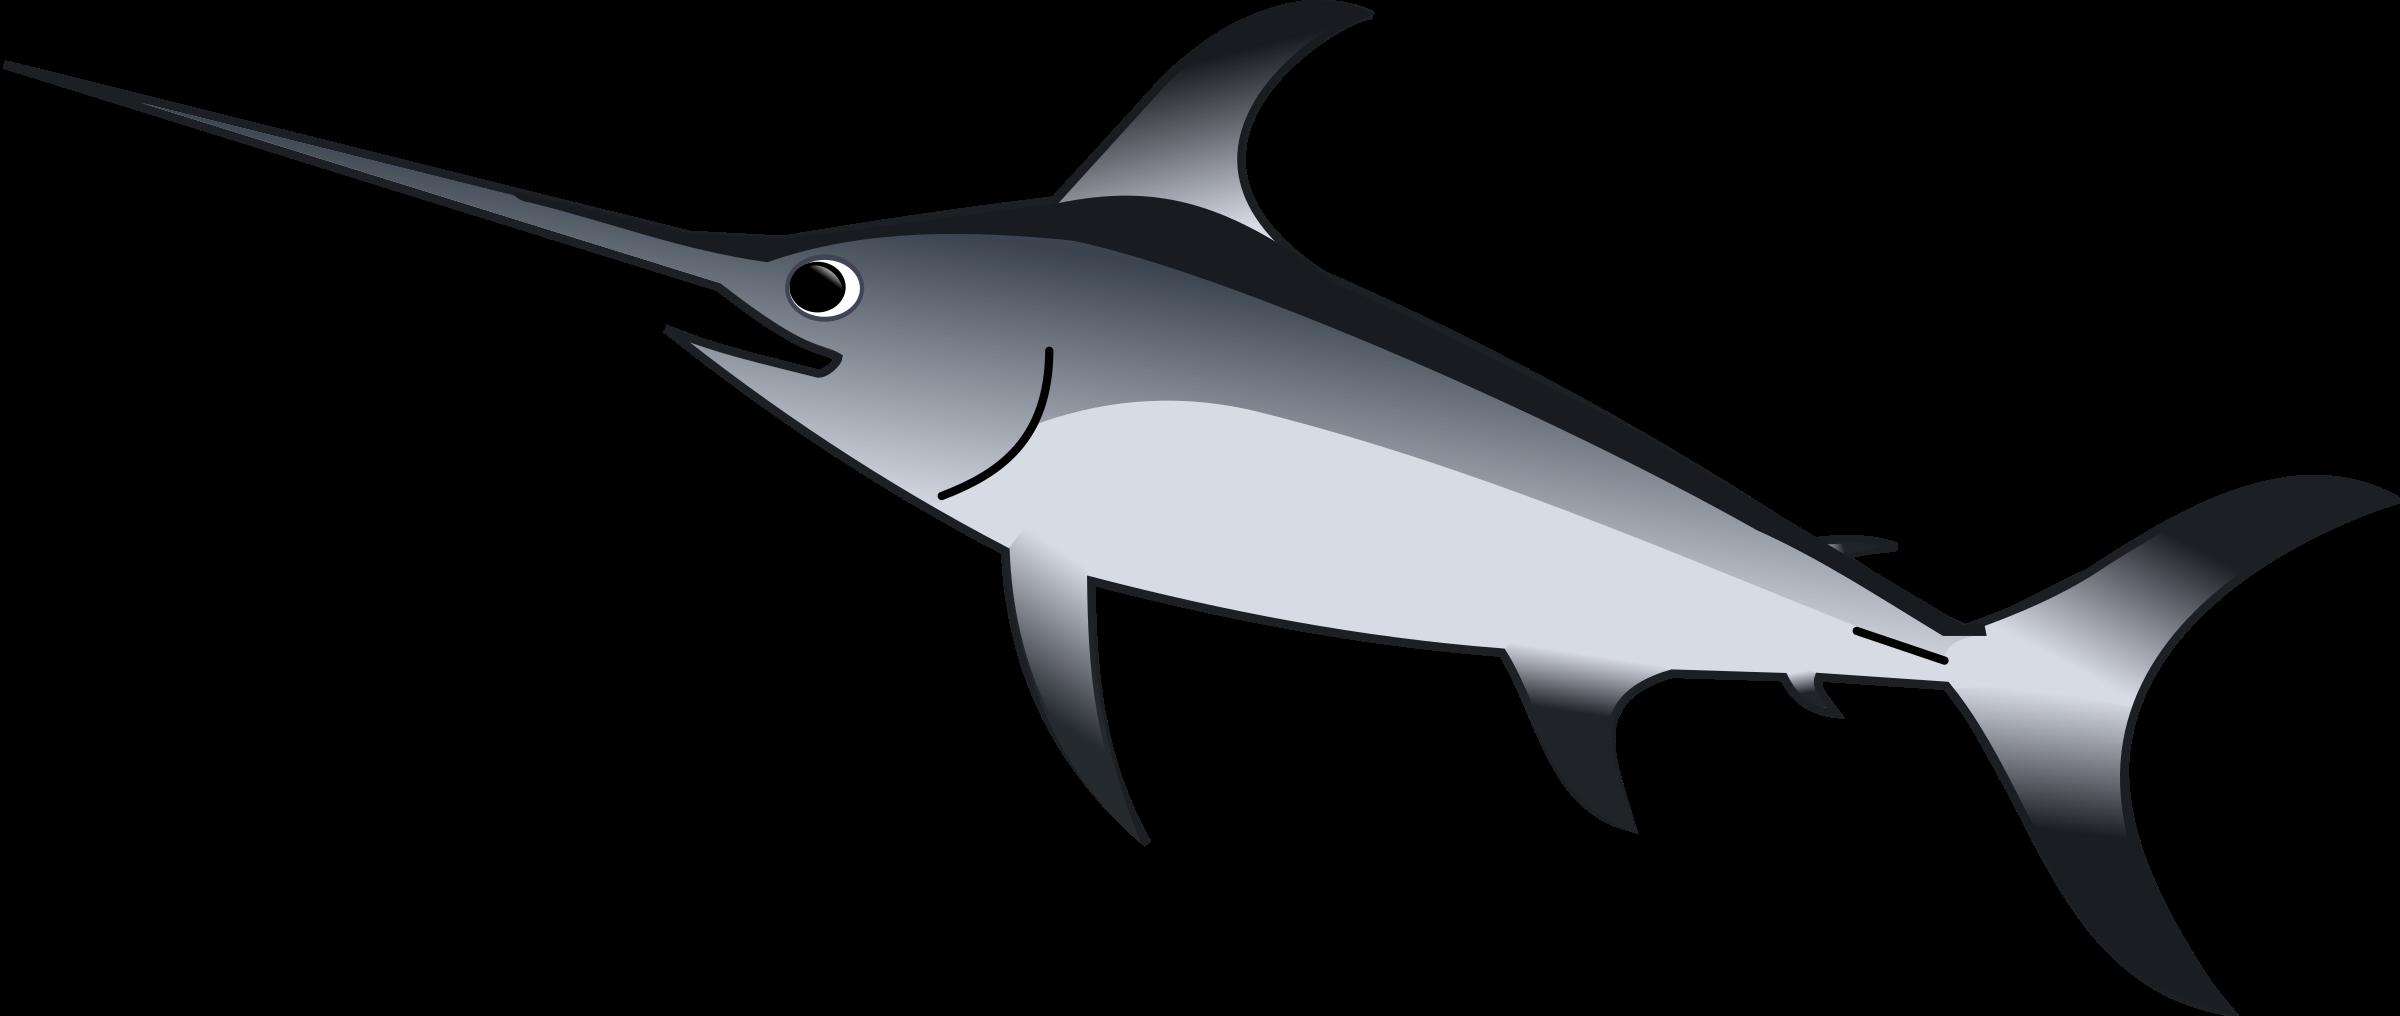 banner black and white stock Gladius big image png. Marlin clipart xiphias.